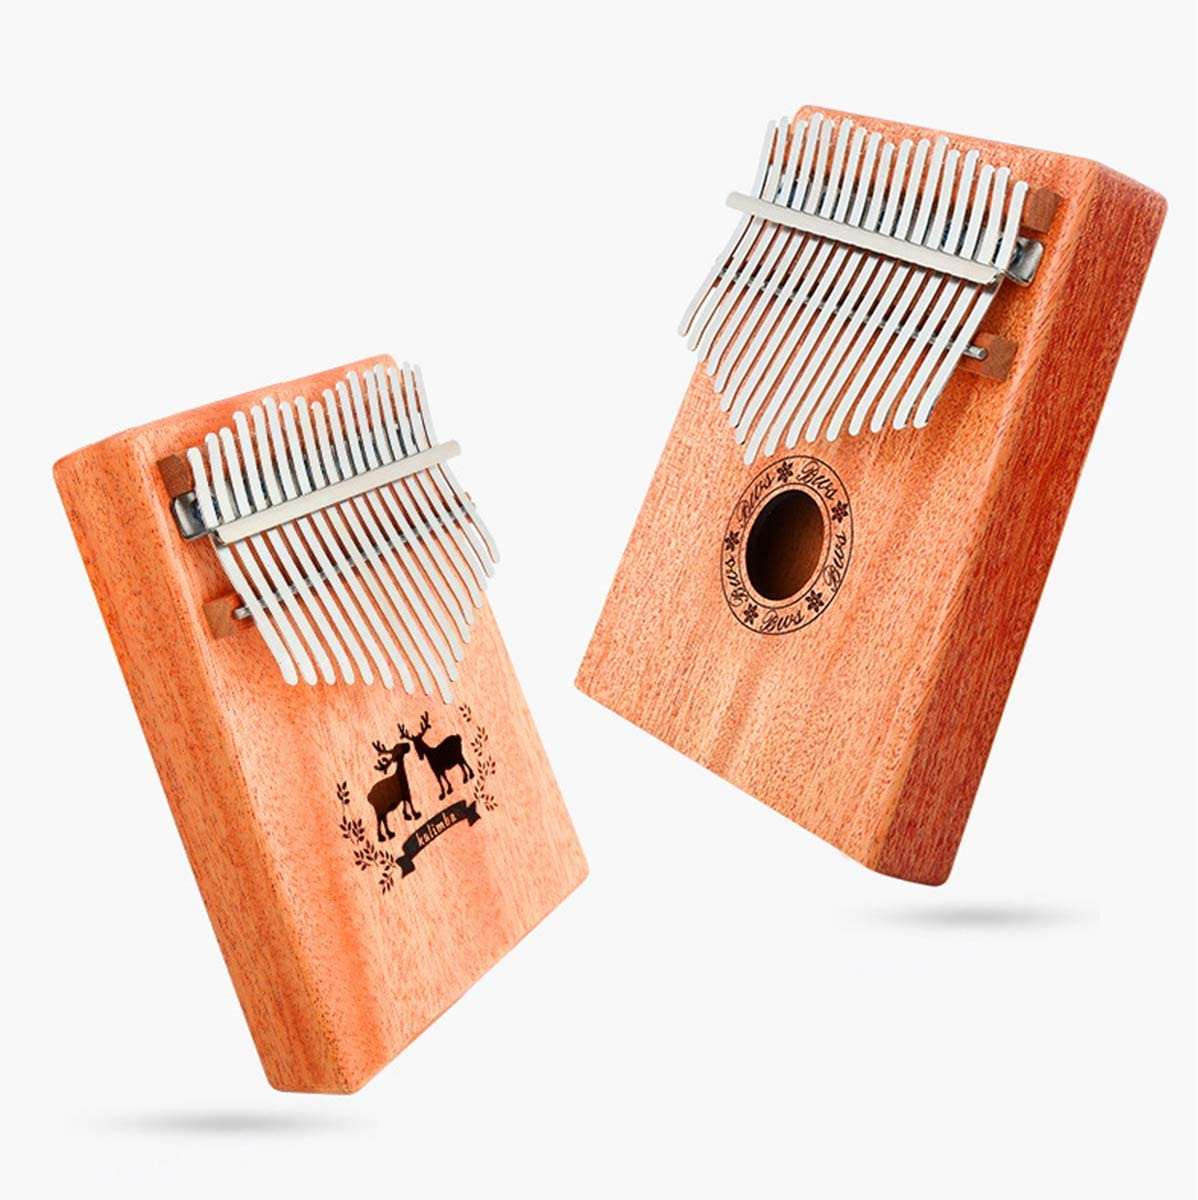 Instrumento musical con martillo de afinaci/ón y libro de aprendizaje Piano de pulgar SunshineFace de 17 teclas idioma espa/ñol no garantizado Color retro. Kalimba de madera